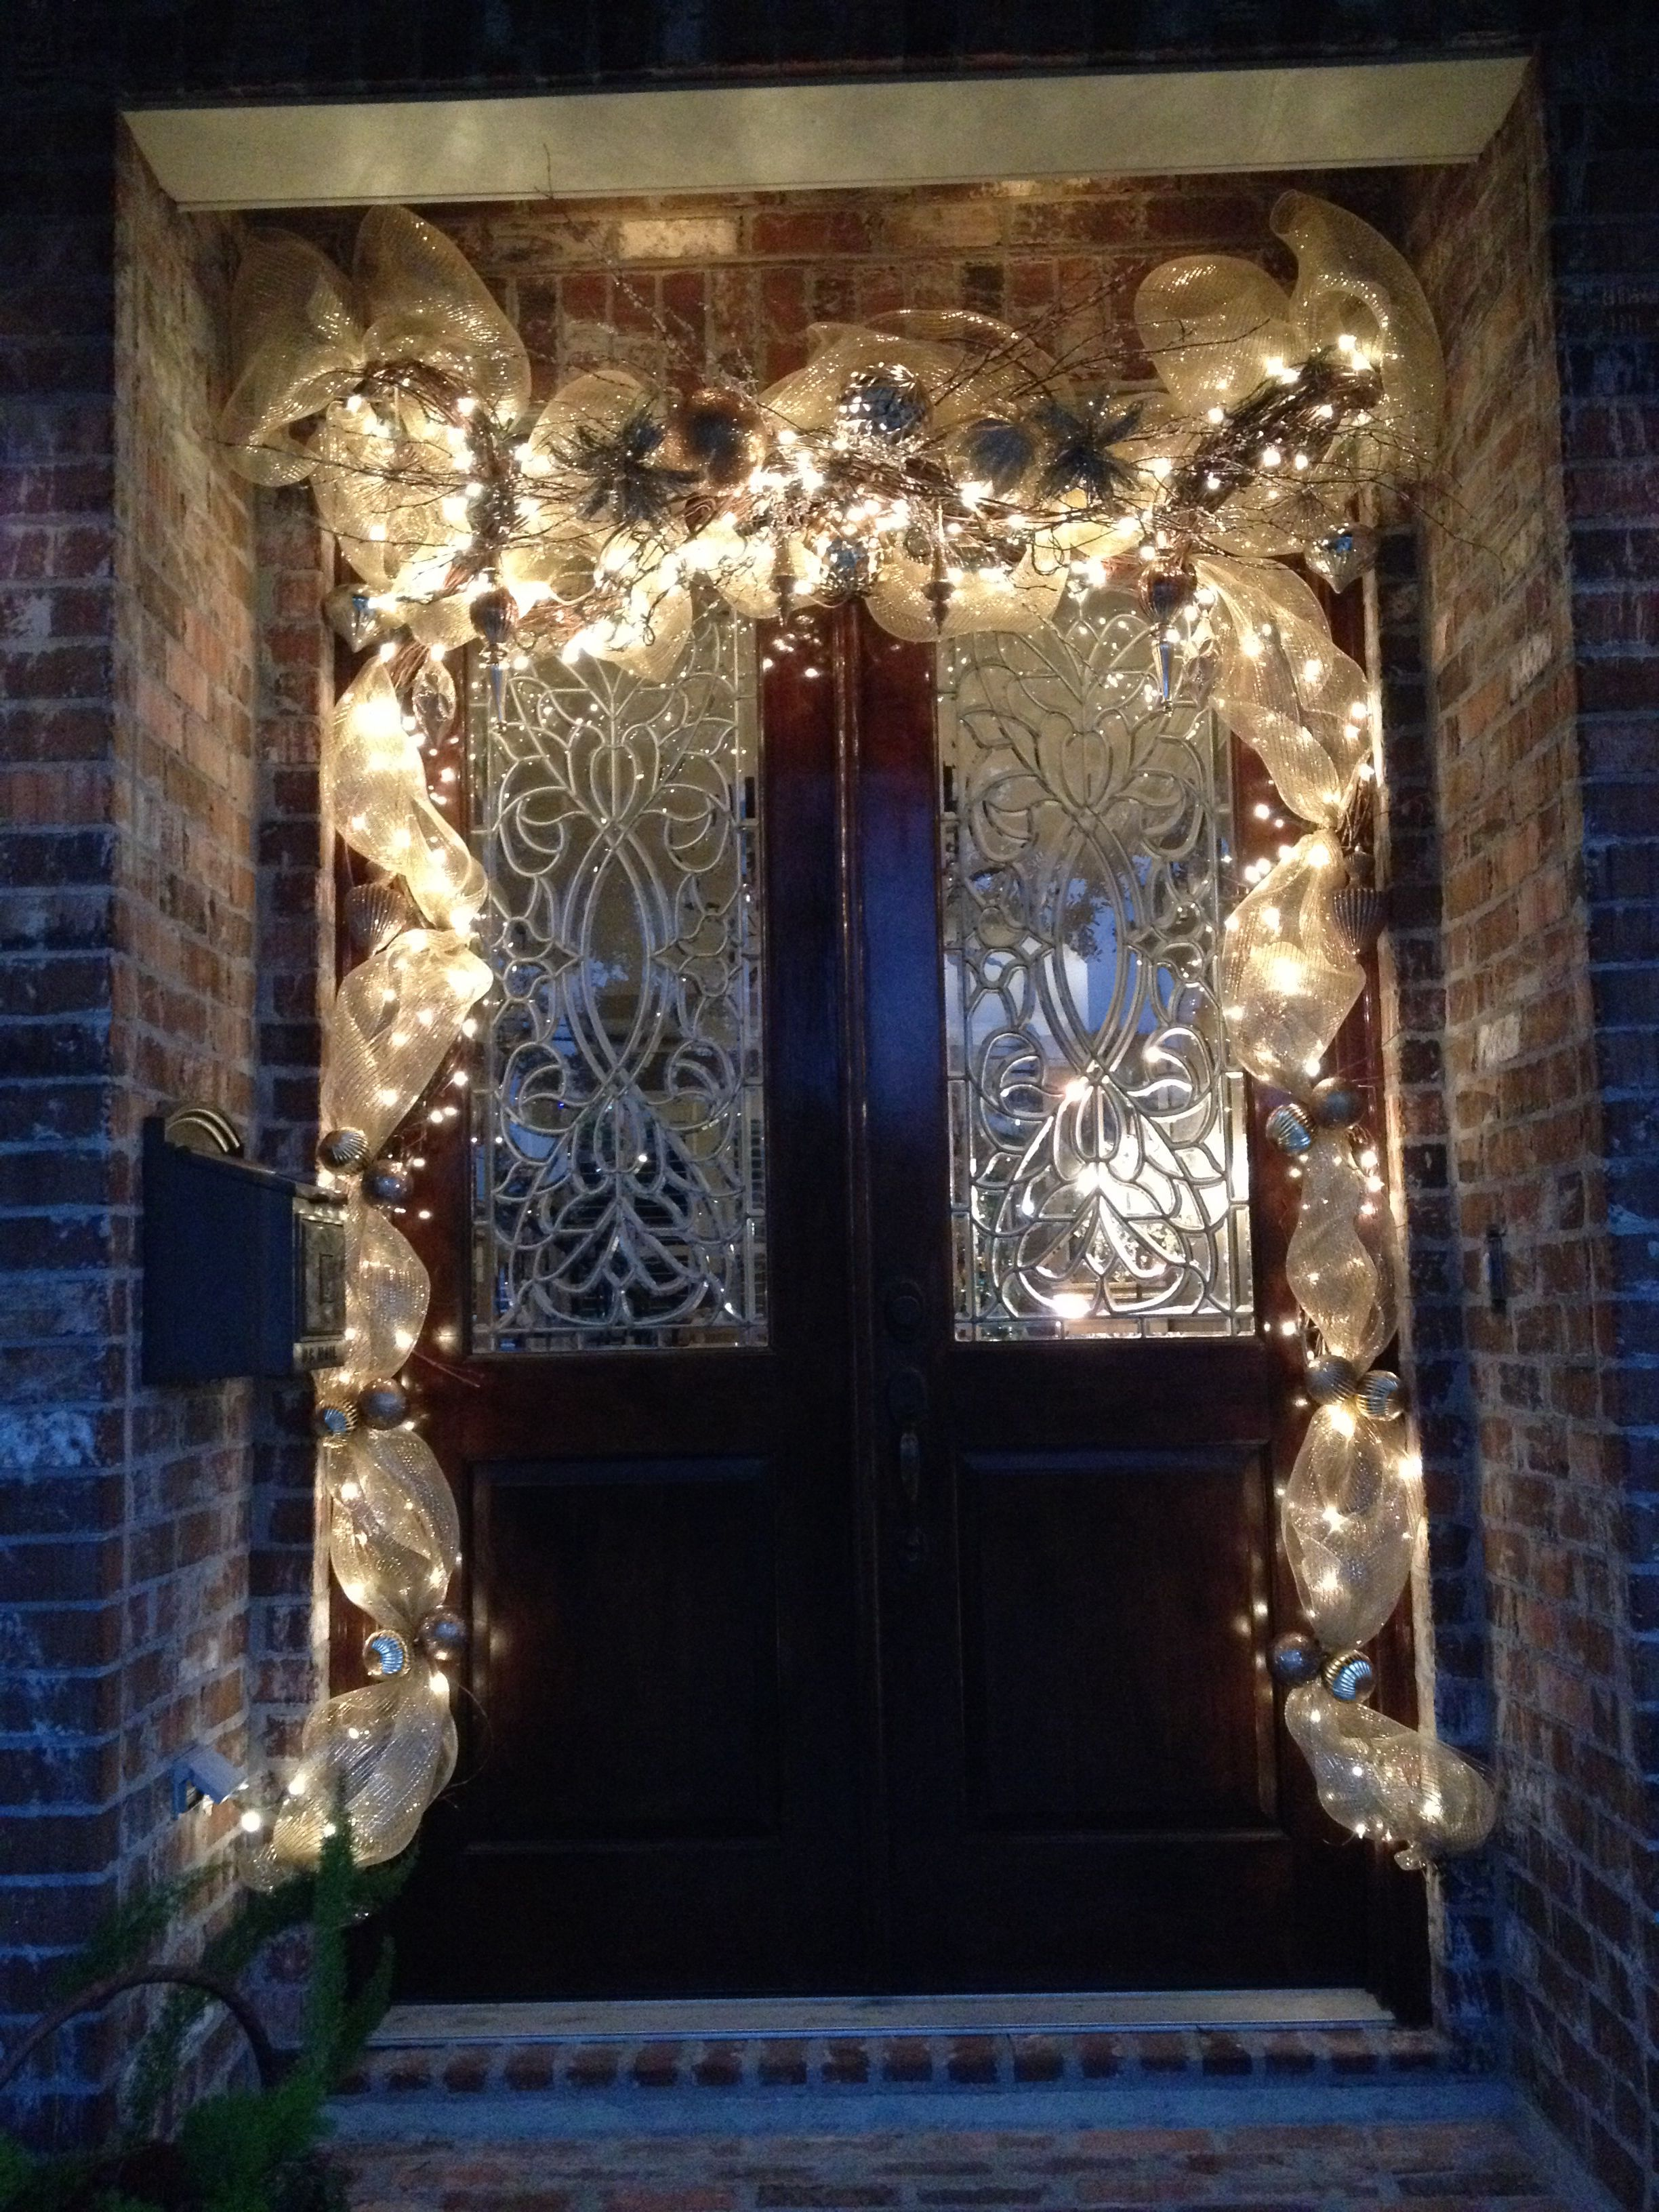 Christmas Door Grapevine Garland | Grapevine garland ... on Vine Decor Ideas  id=44472